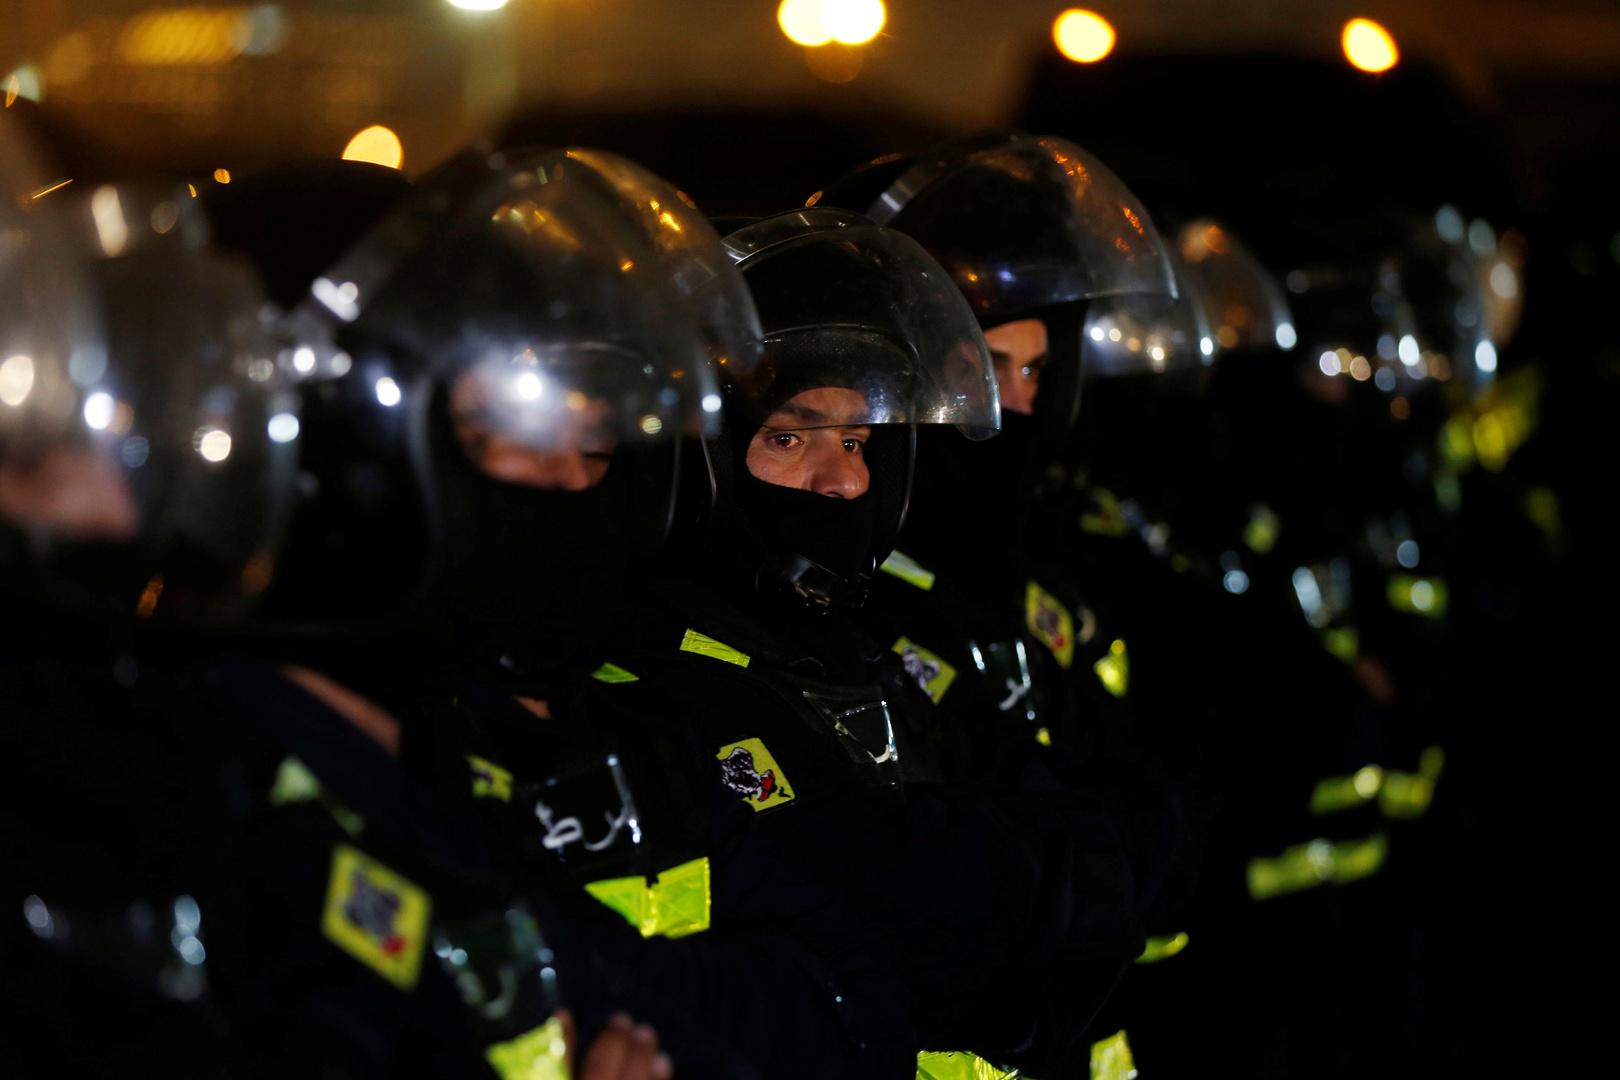 Jordan.  Arrest of an officer and policemen